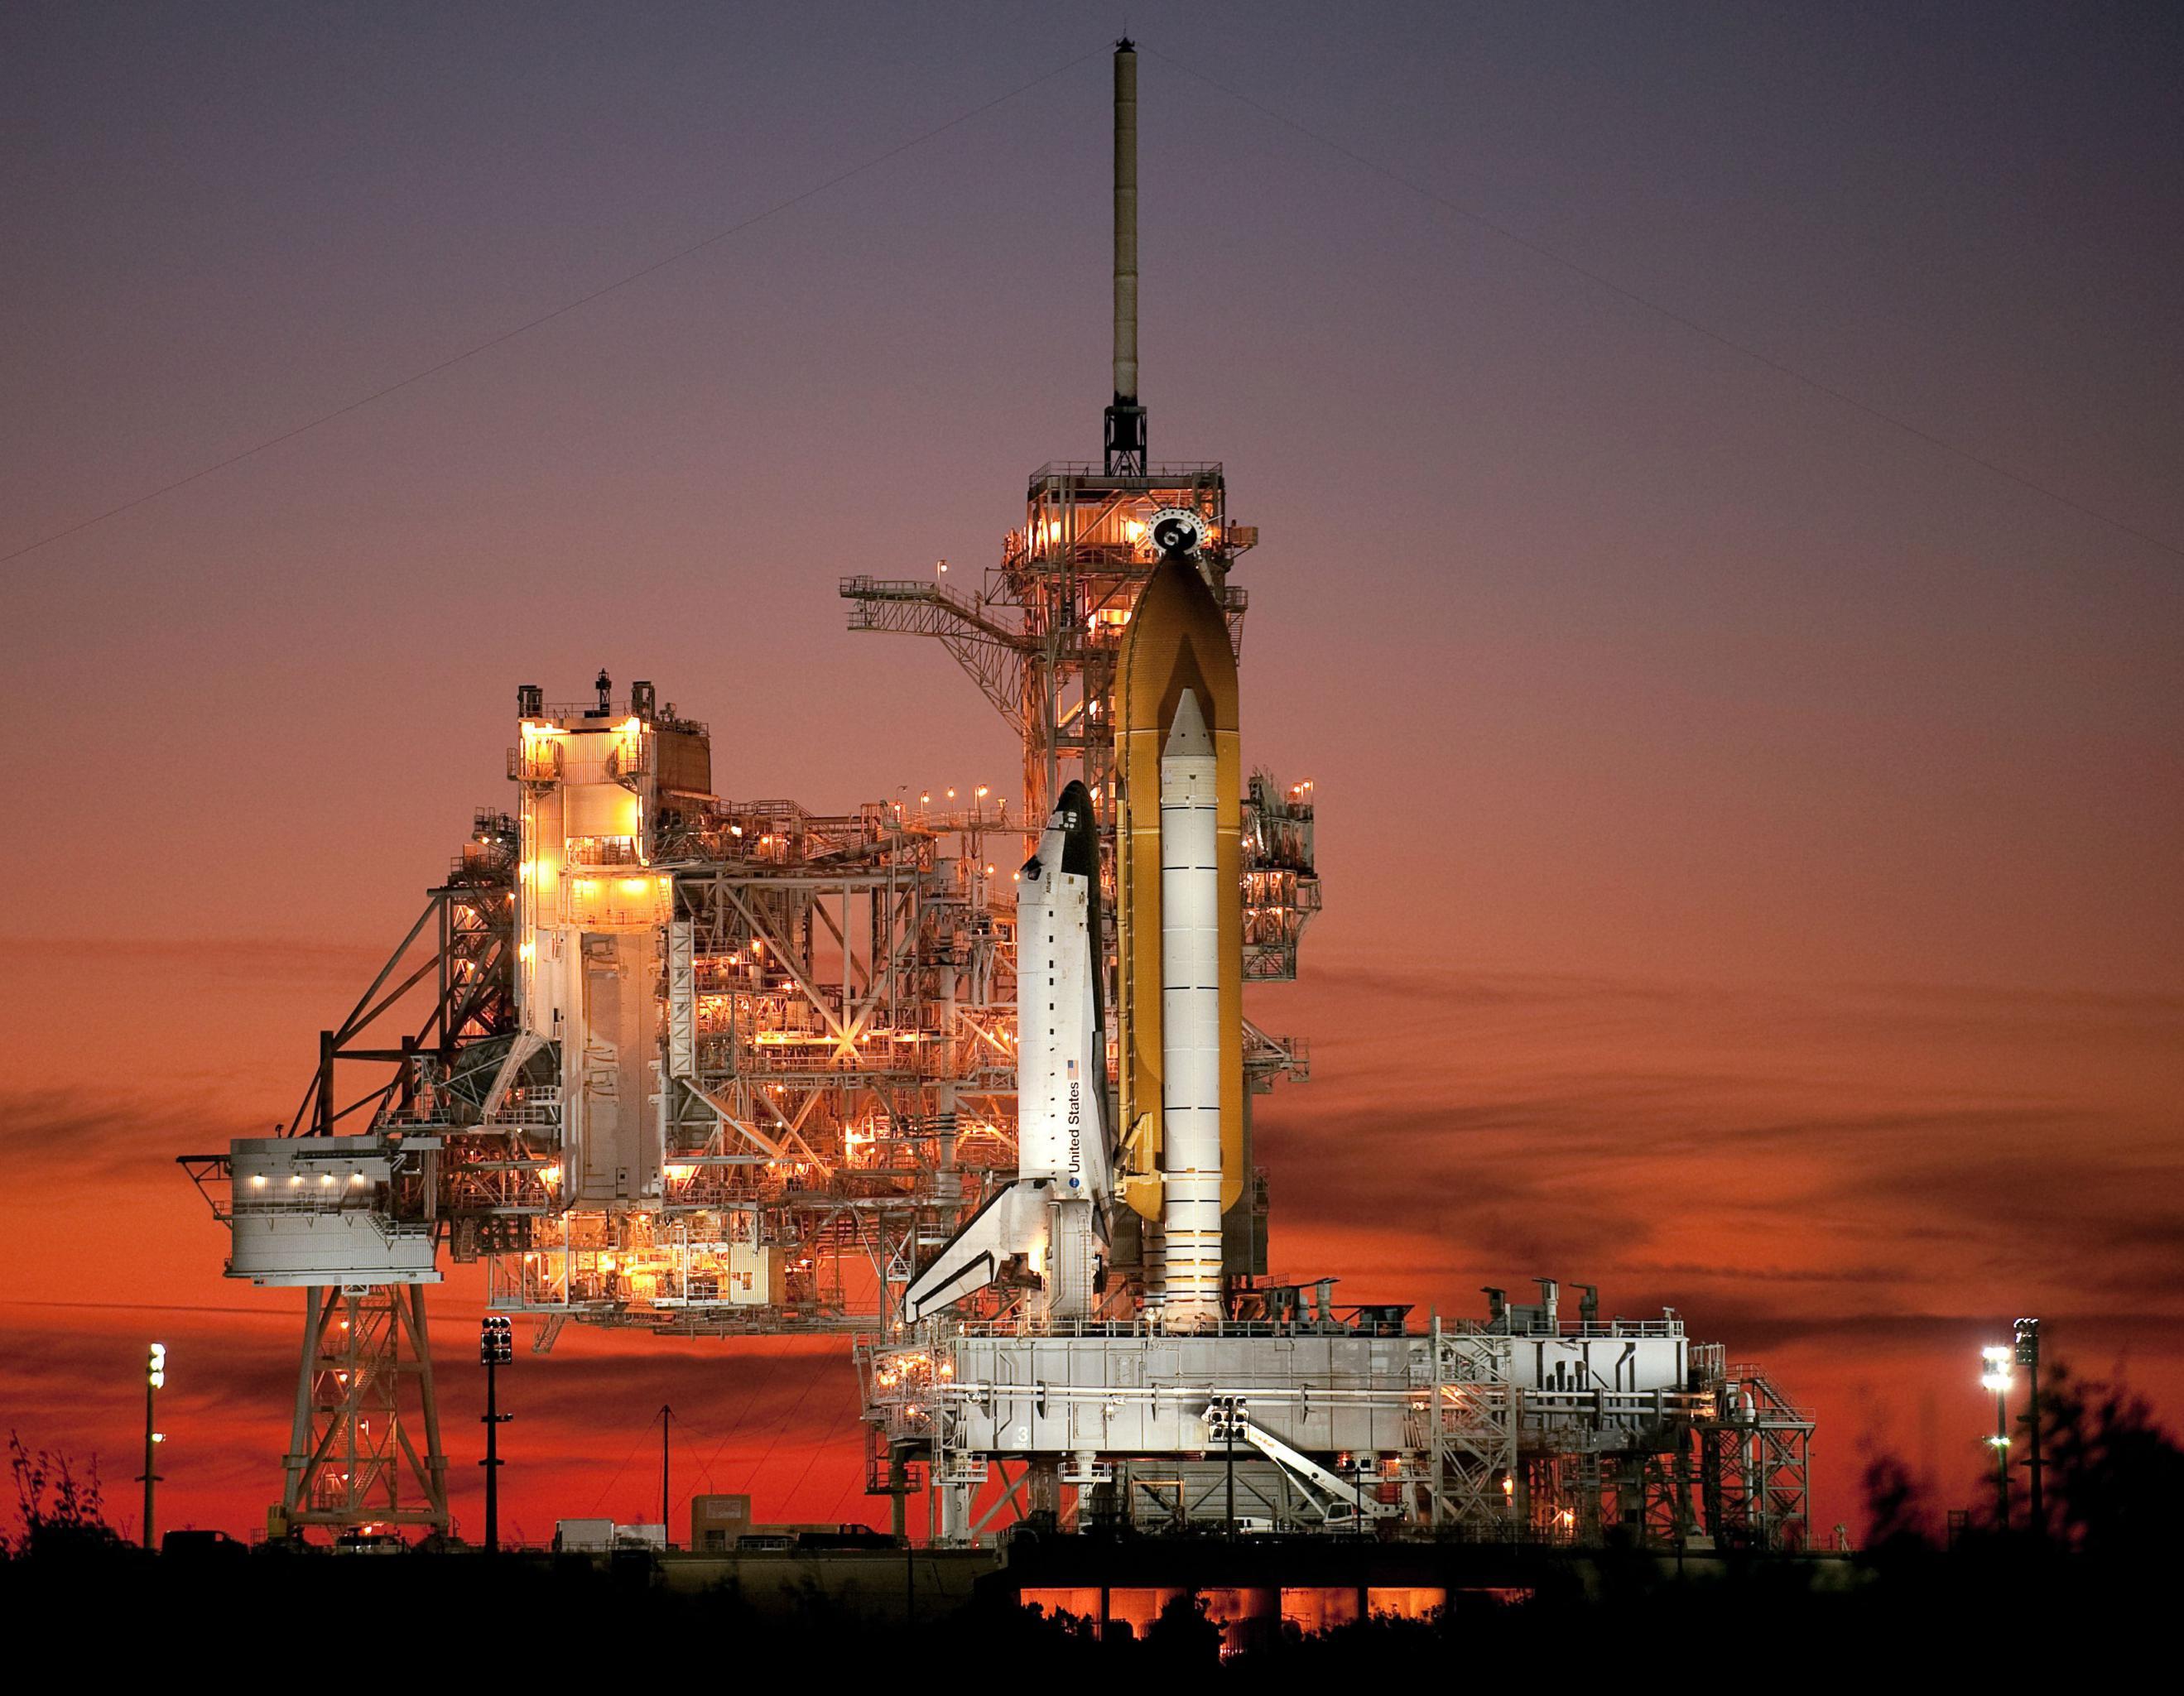 Shuttle Atlantis 39A STS-129 Nov 2009 (NASA) (c)